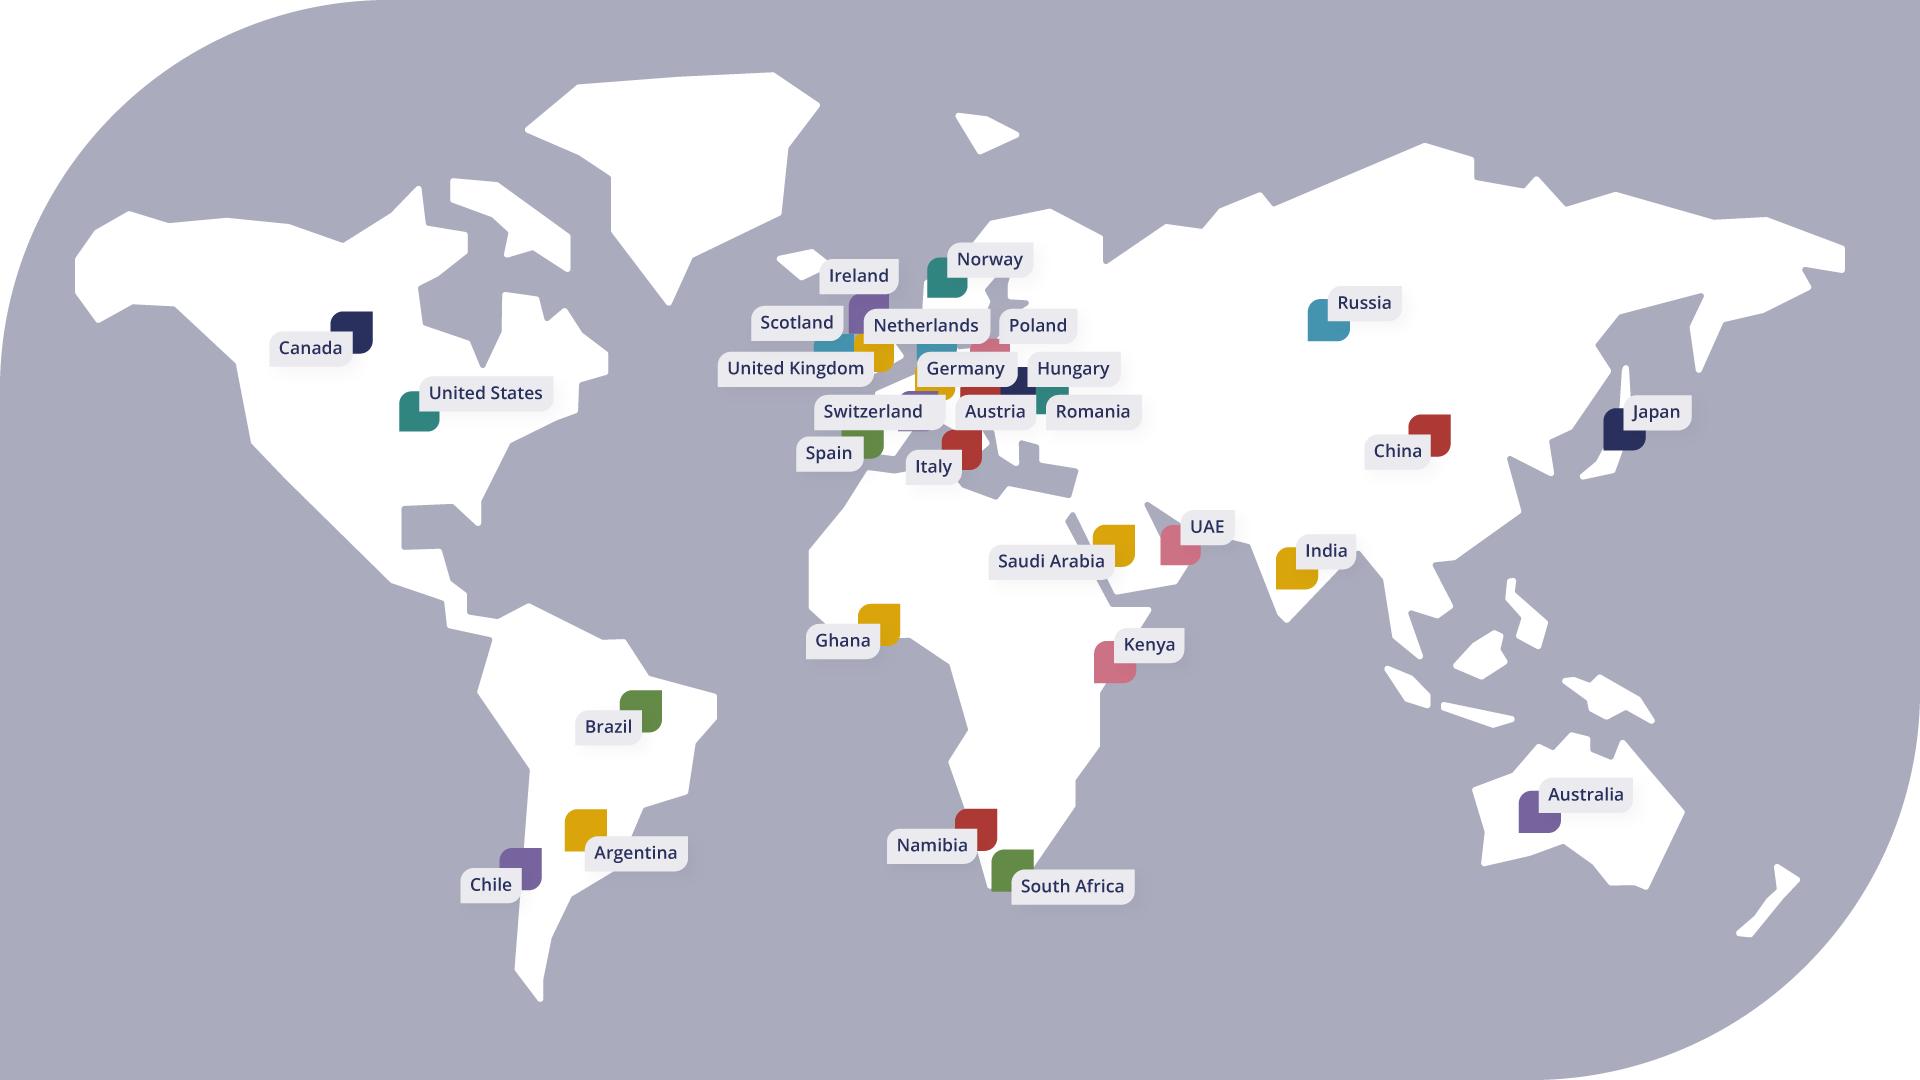 NZ_LinkedIn_Coach-Map-Option-5